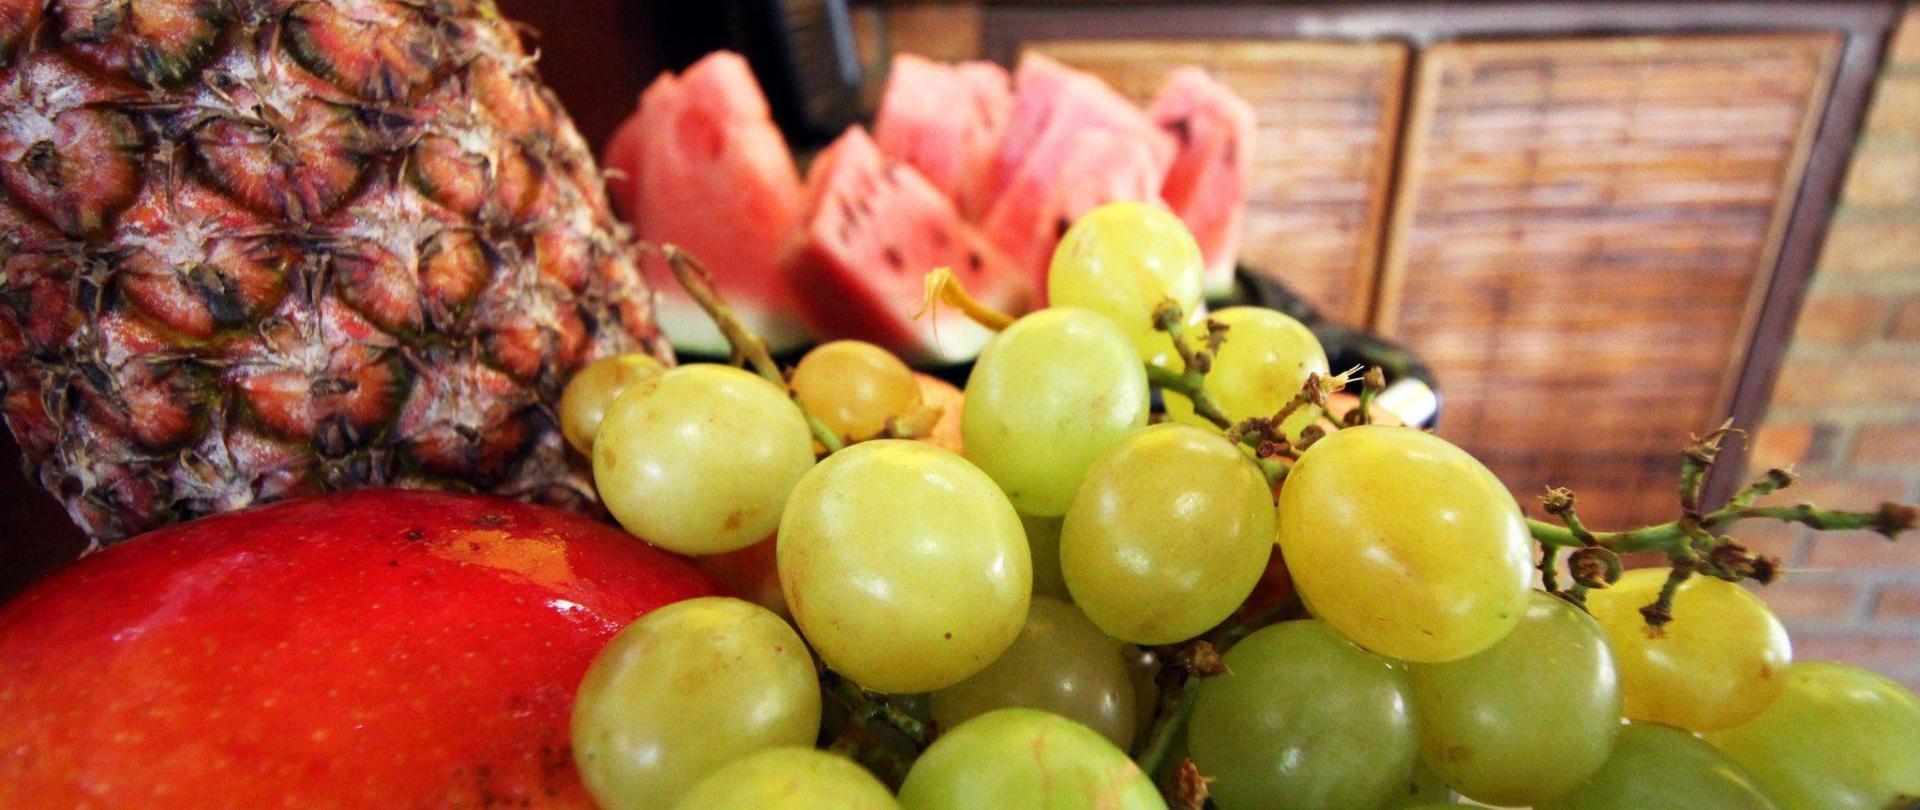 bf3-fruits.jpg